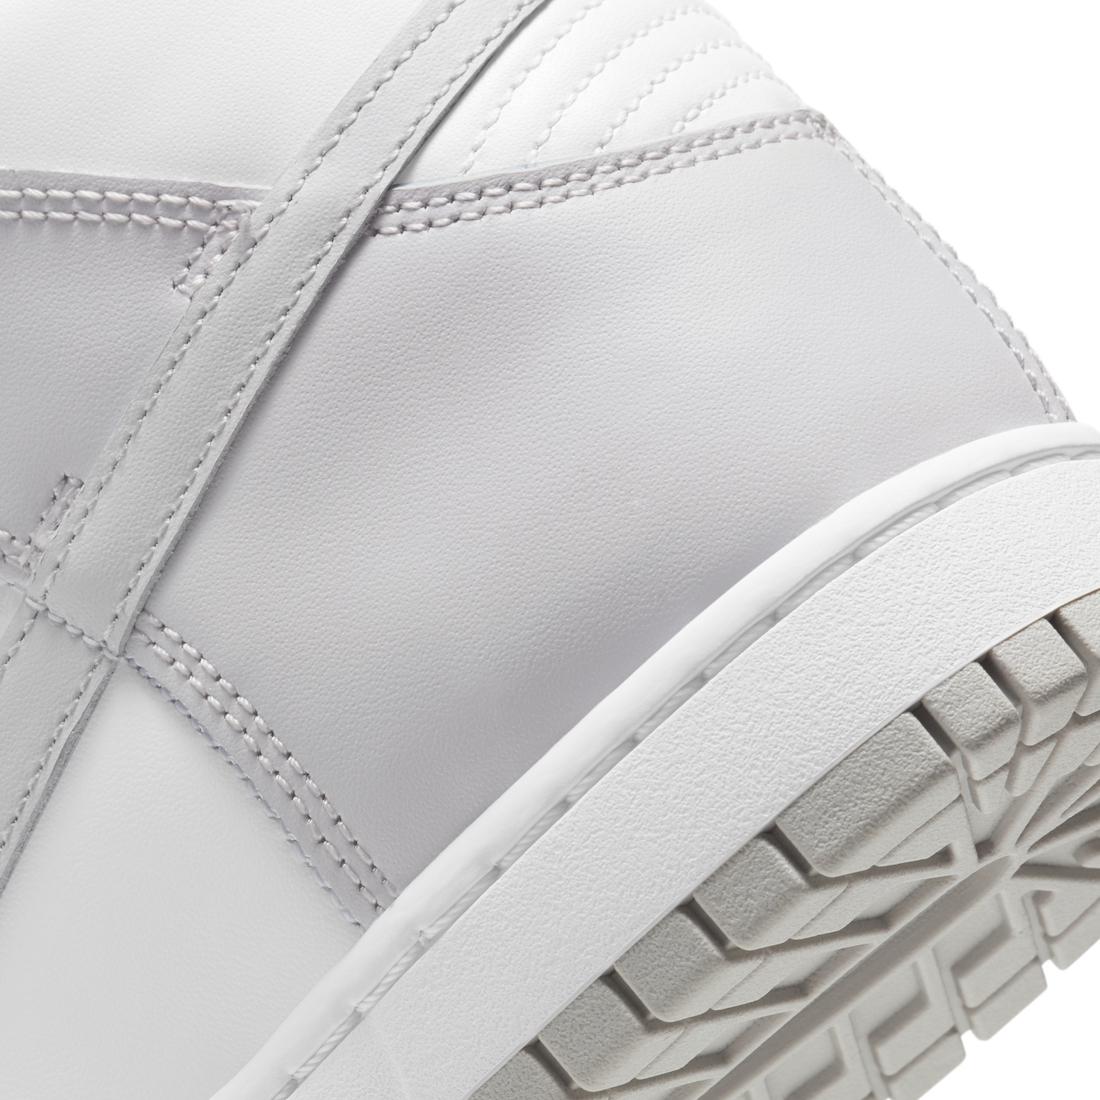 Nike Dunk High Vast Grey DD1399-100 Release Date Info